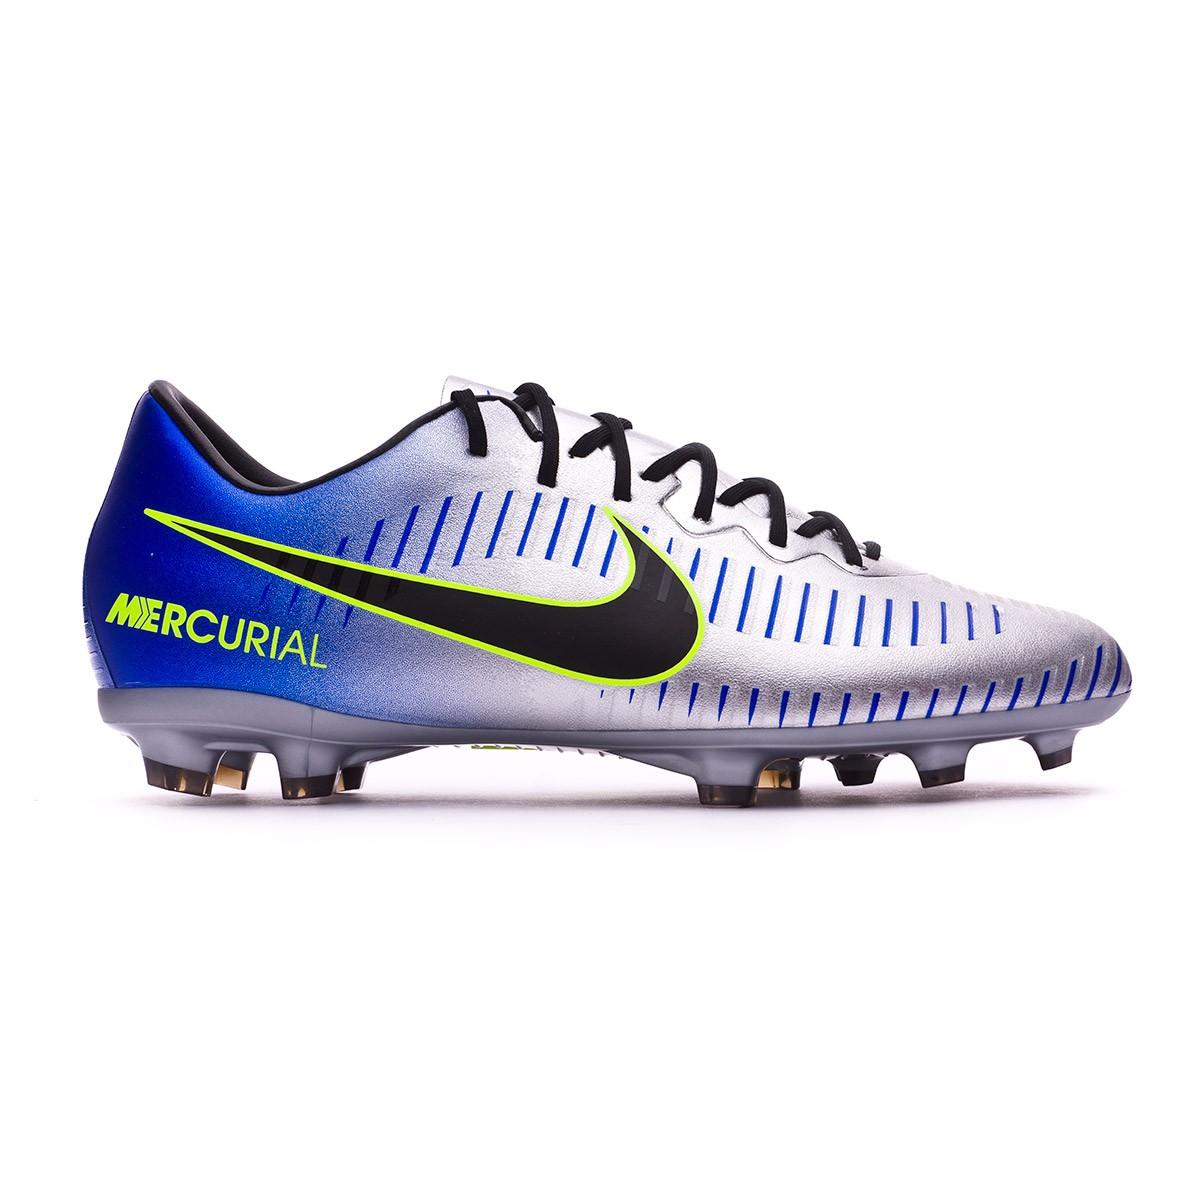 a7e146017 Football Boots Nike Kids Mercurial Vapor XI FG Neymar Racer blue-Black-Chrome-Volt  - Tienda de fútbol Fútbol Emotion